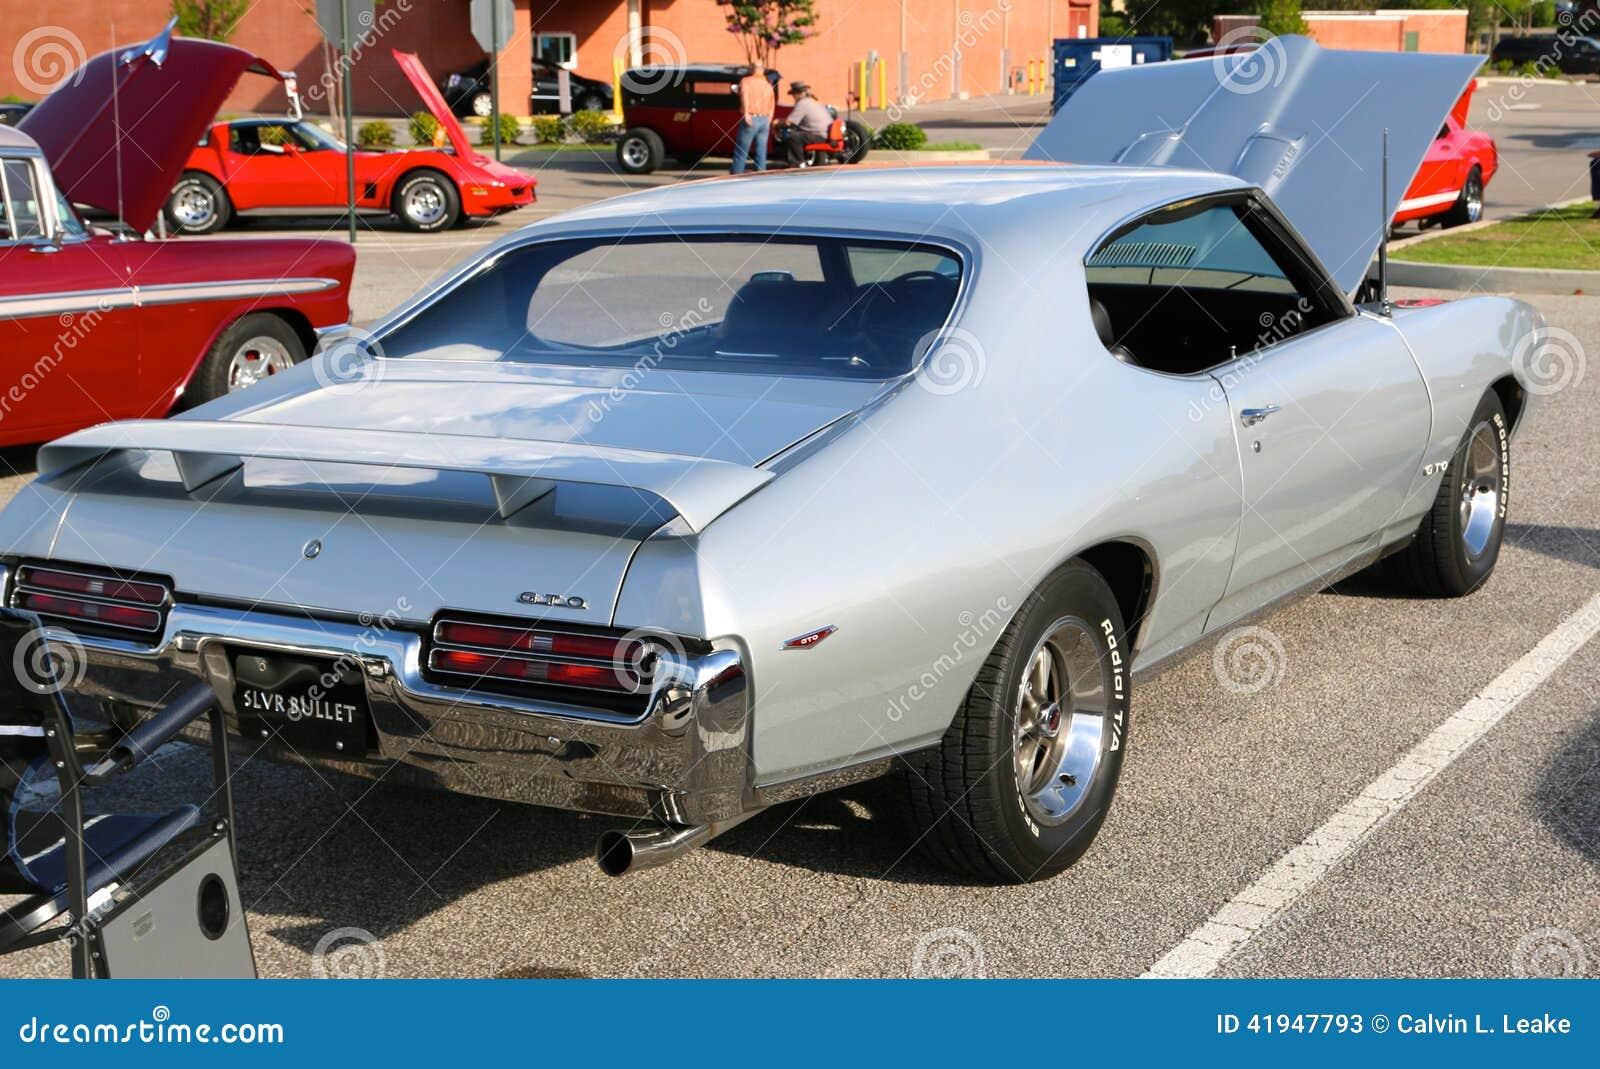 Rear View Of 1969 Silver Pontiac Gto Editorial Stock Photo